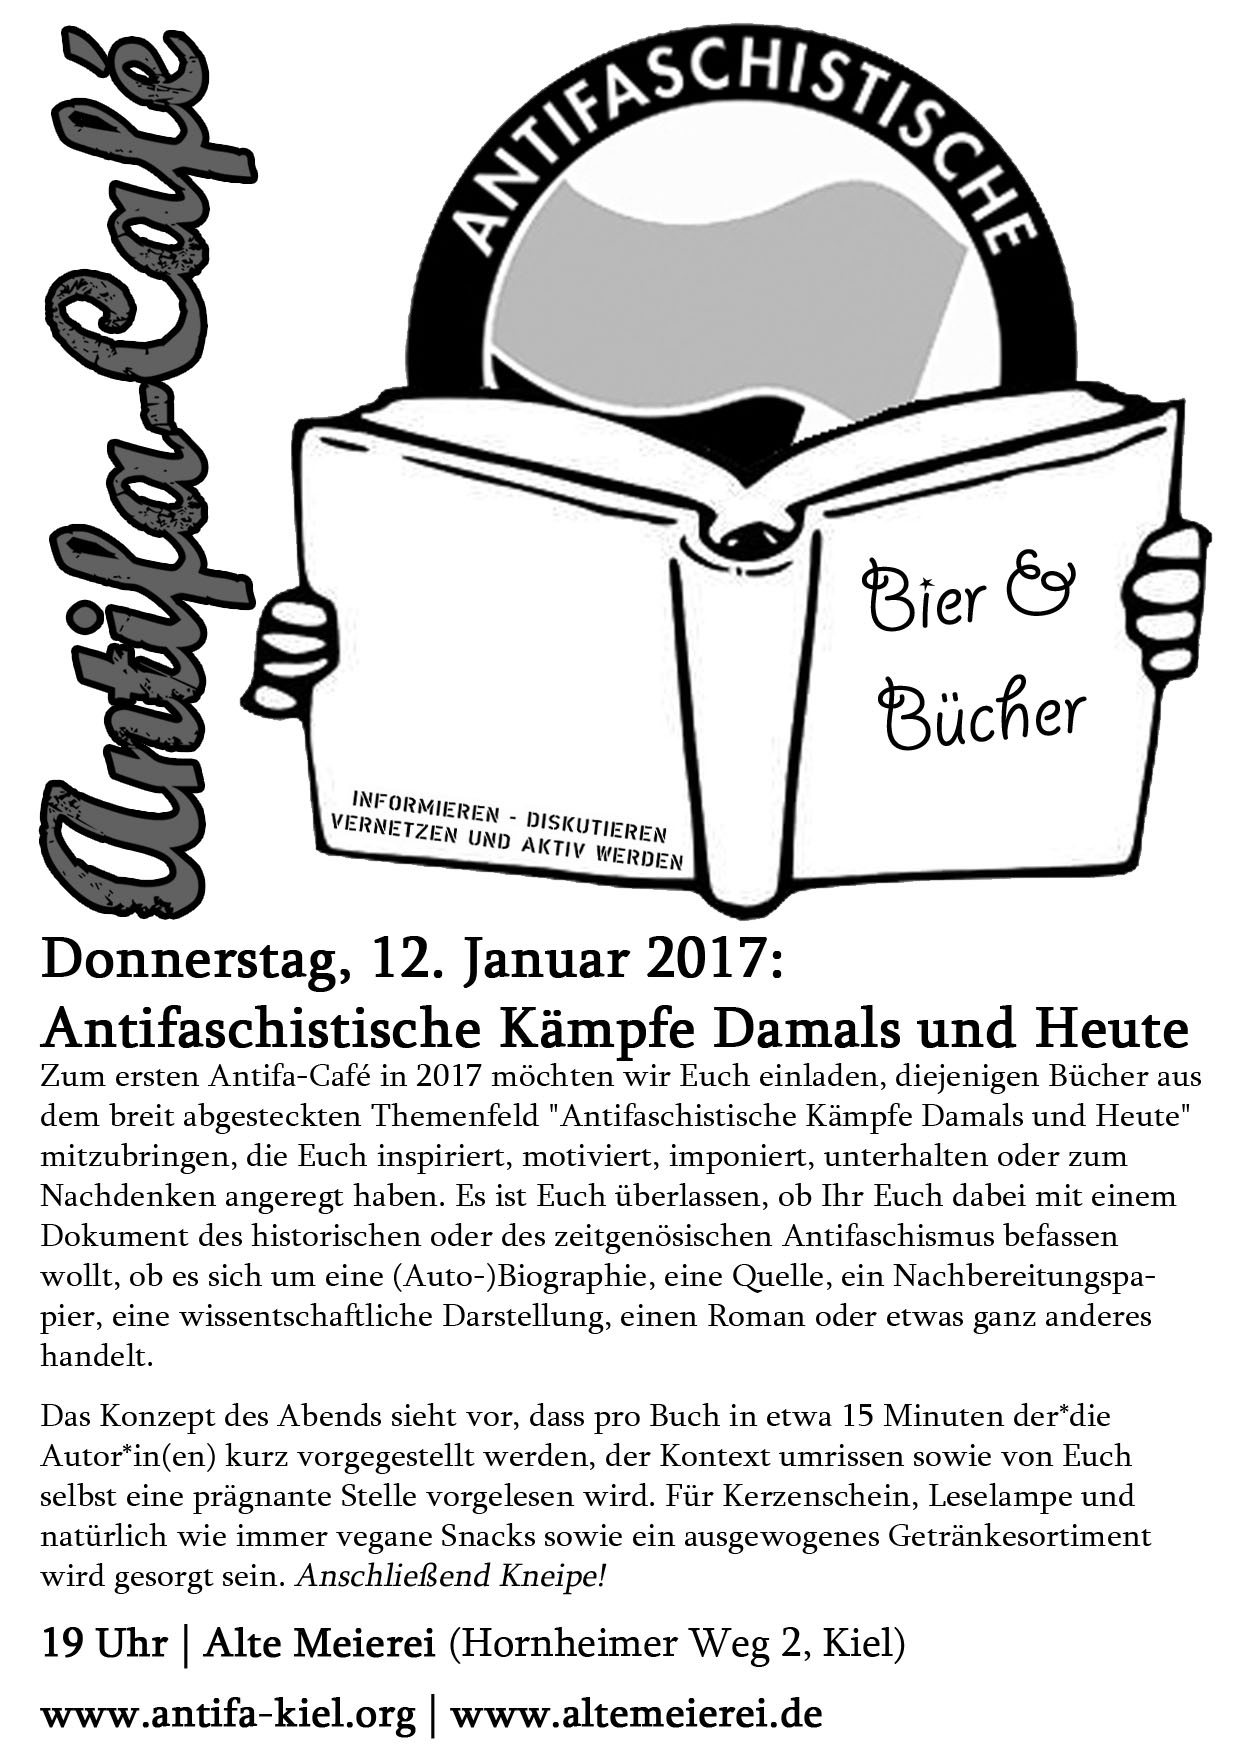 http://www.neu.antifa-kiel.org/wp-content/uploads/import/antifa-cafe/bierundbuecher.jpg